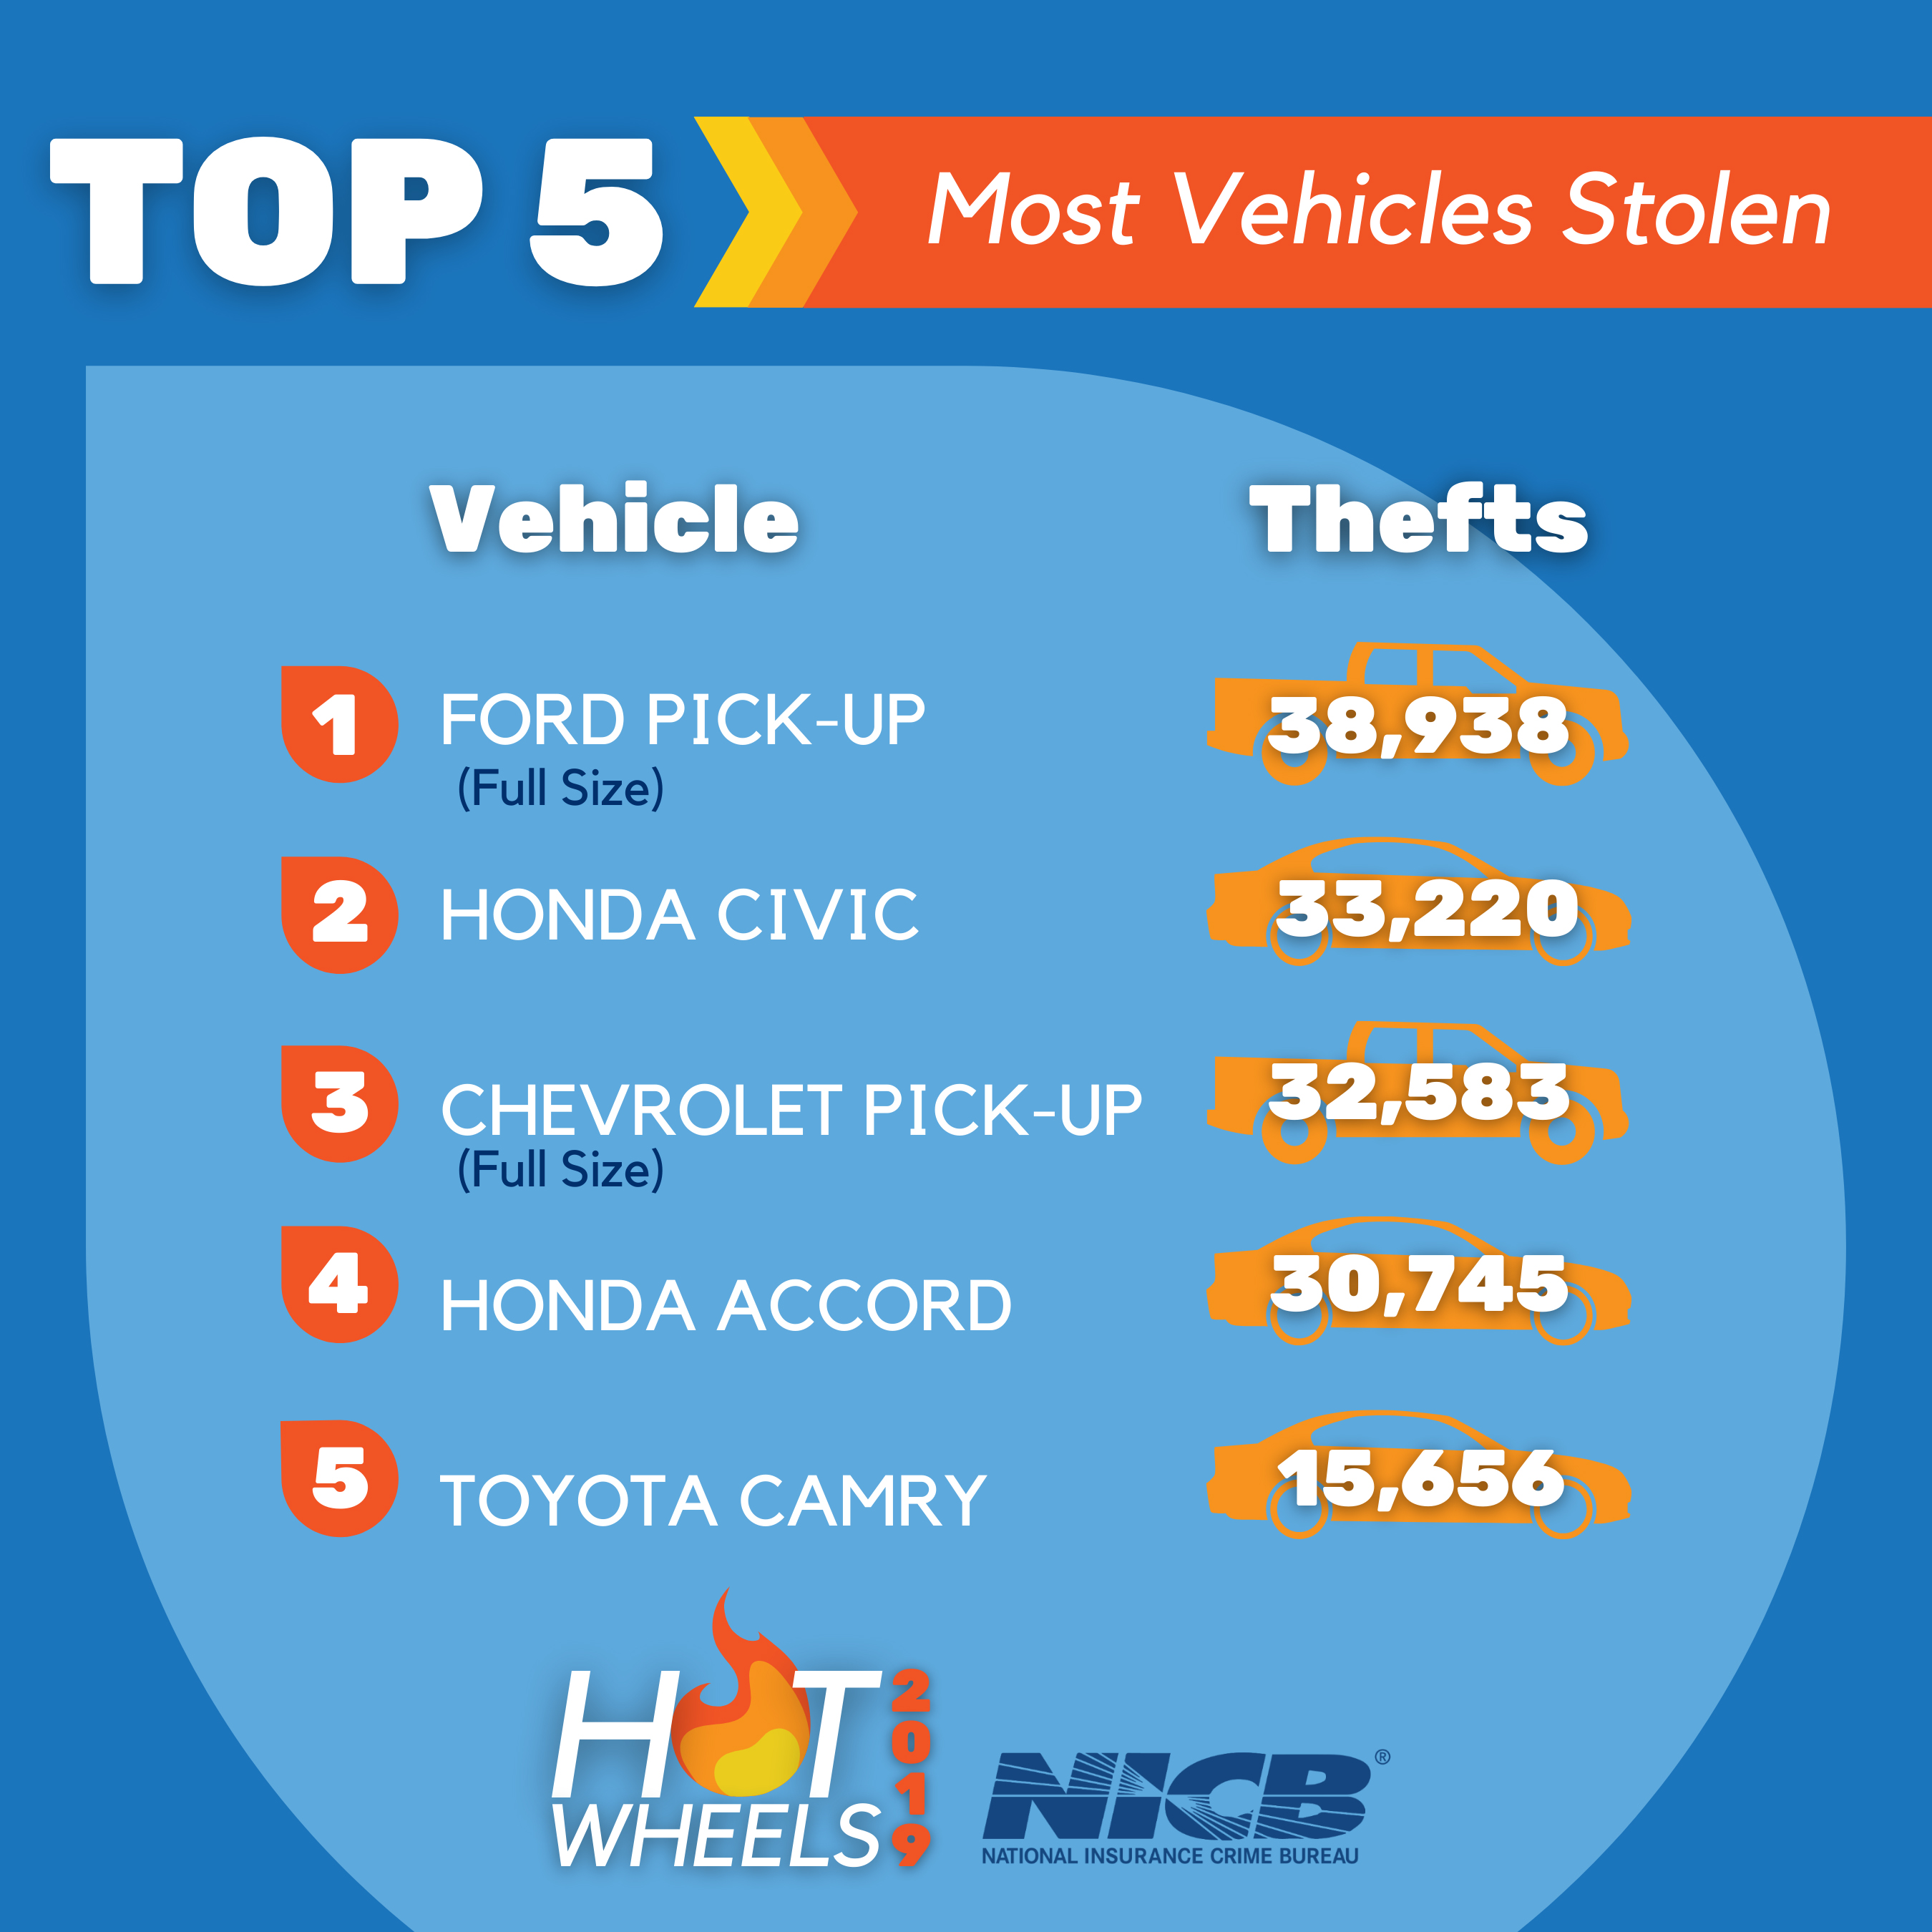 Hot Wheels 2019   Top 5 Most Stolen Vehicles